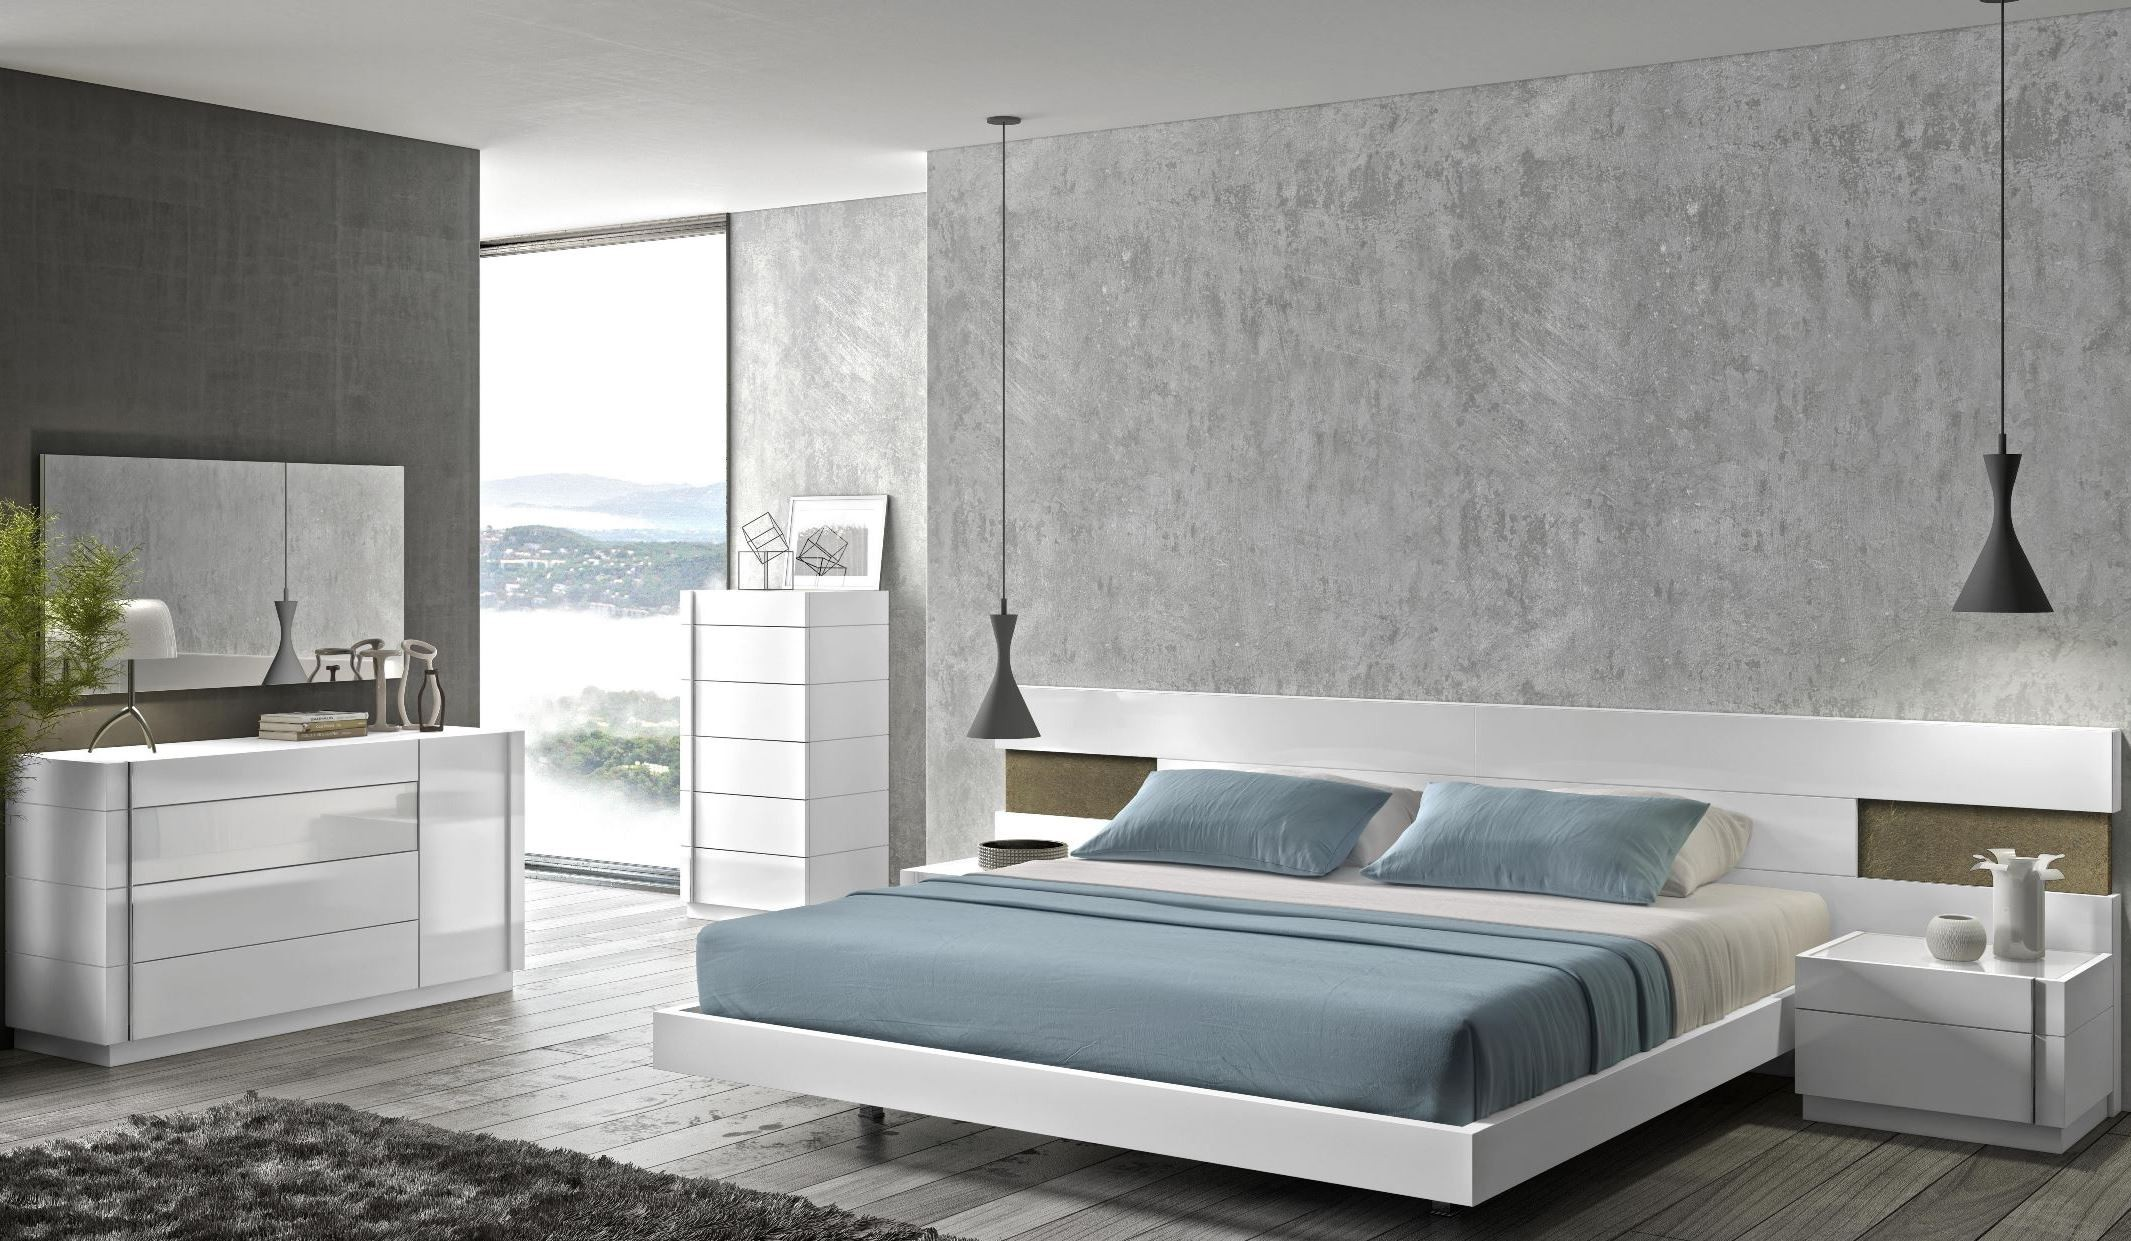 amora natural white lacquer platform bedroom set from j m 17869 q